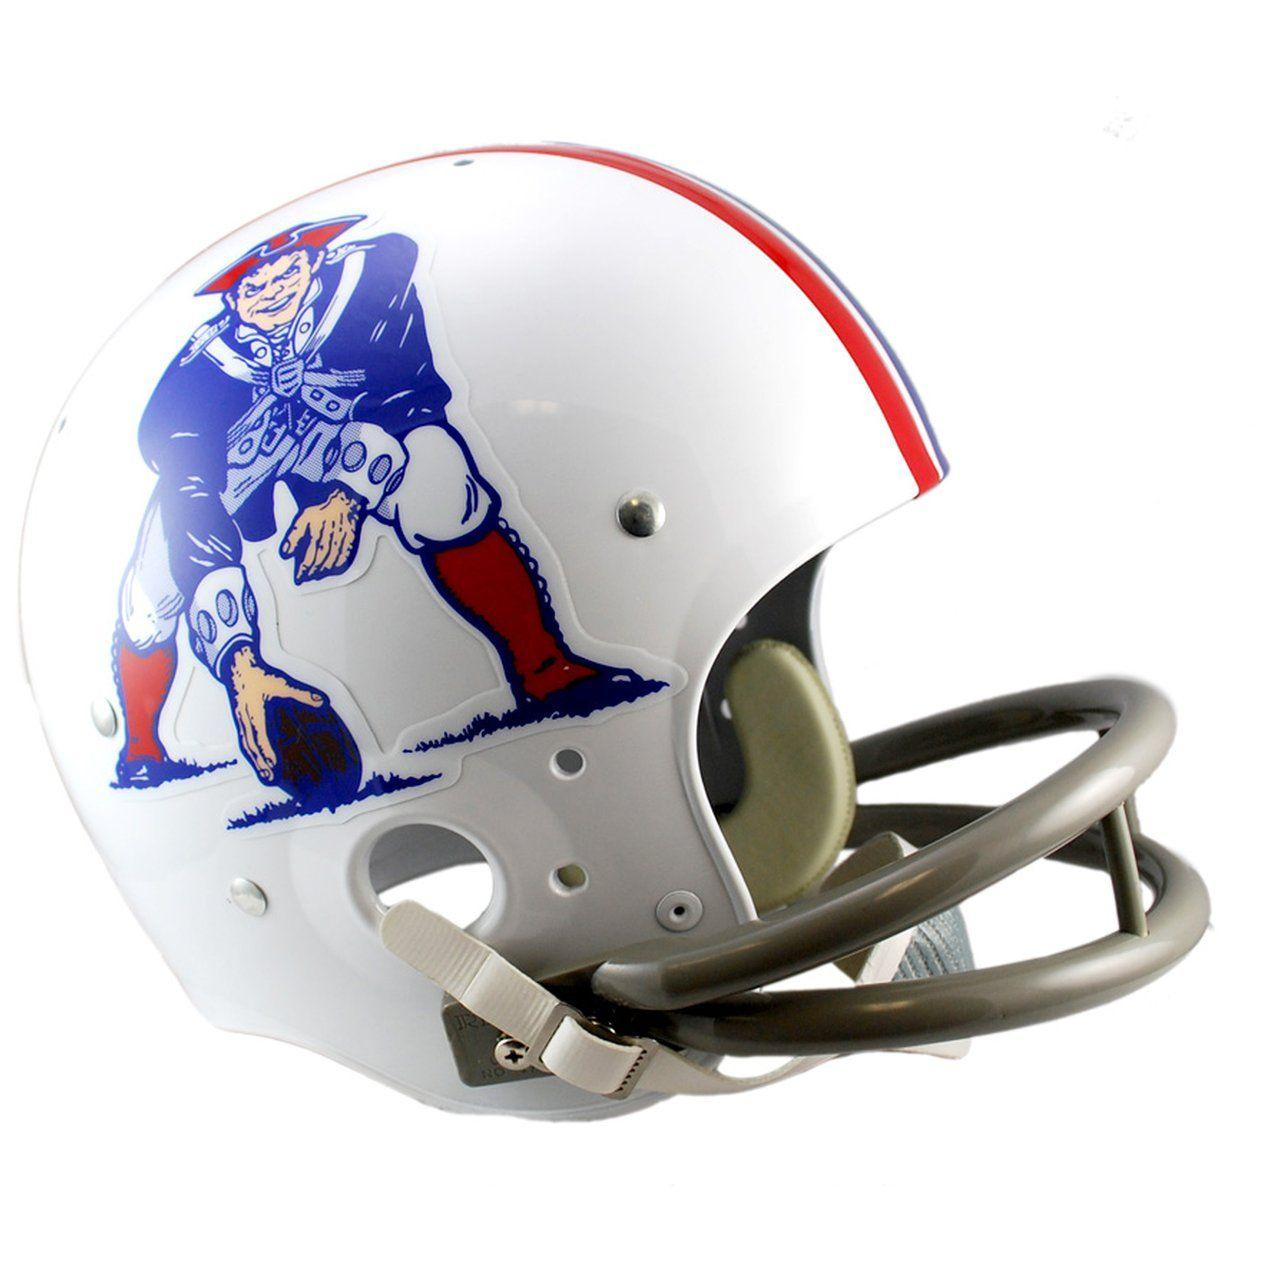 amfoo - Riddell TK Replica Football Helm New England Patriots 65-81